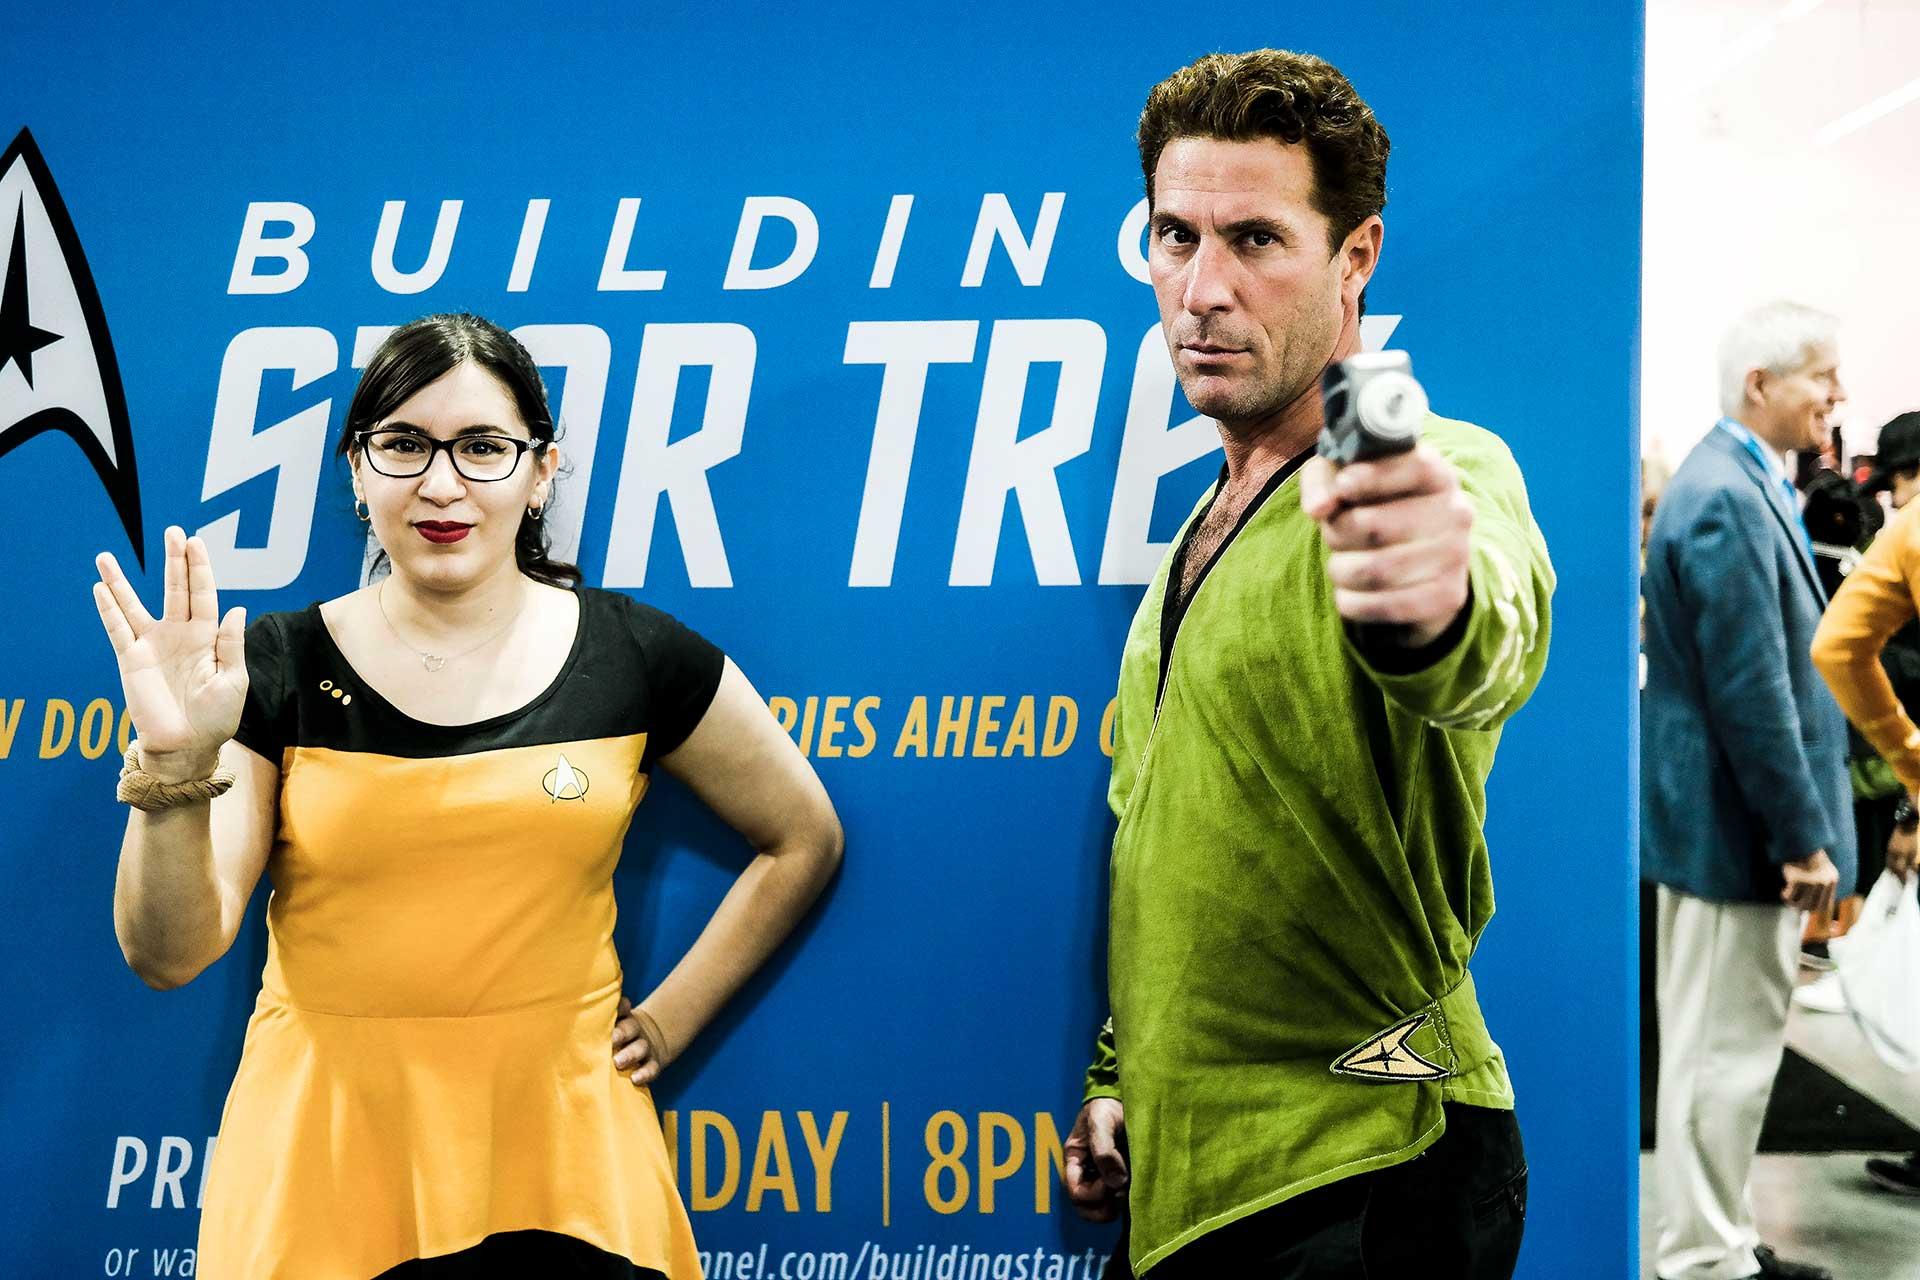 Start Trek costumes